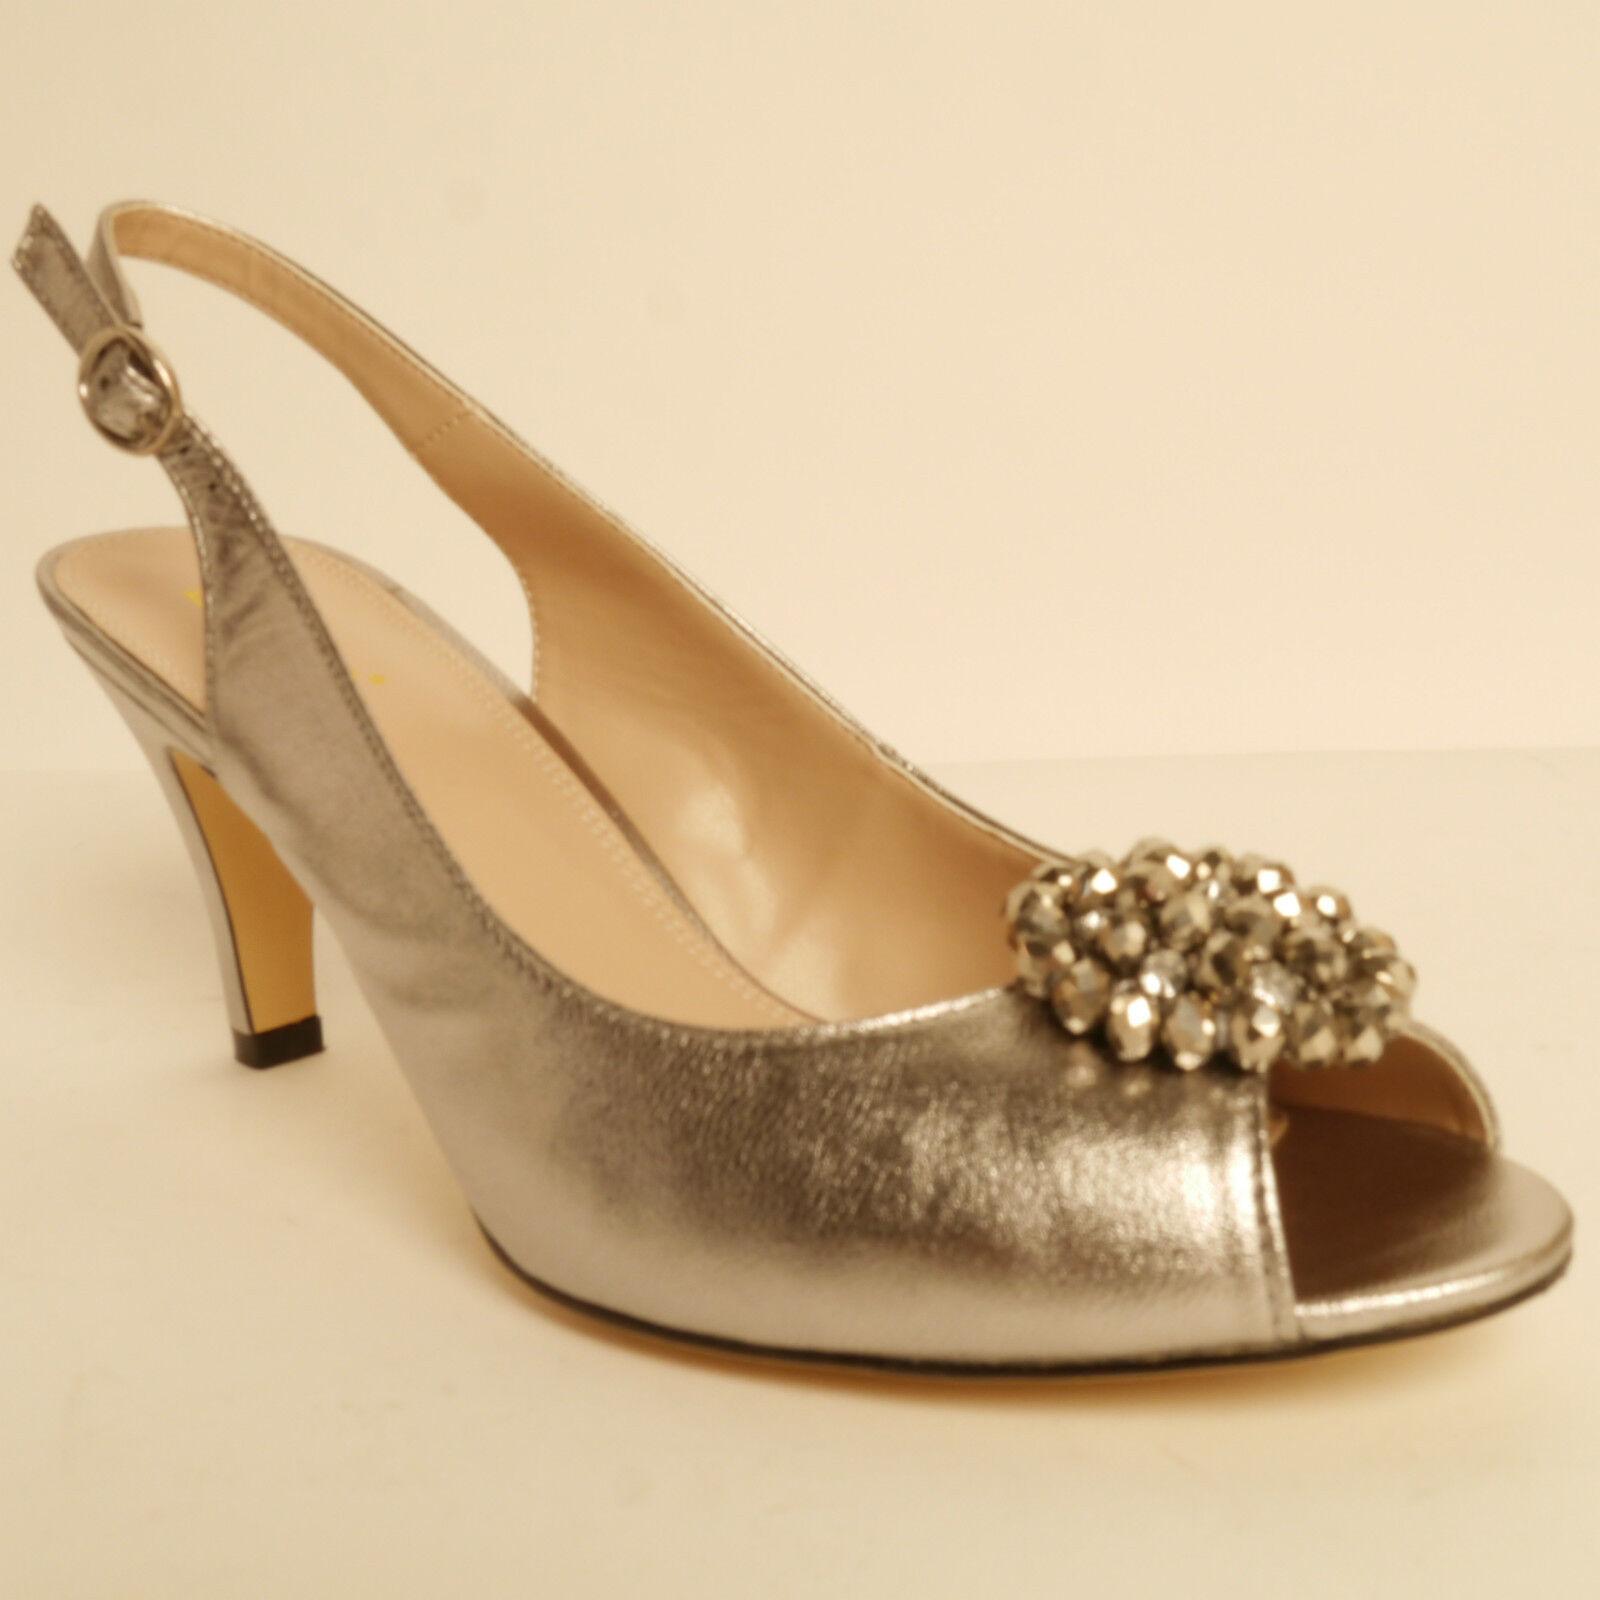 Lotus Fascination Open Back Peep Toe Dress Shoe Pewter Patent Leather